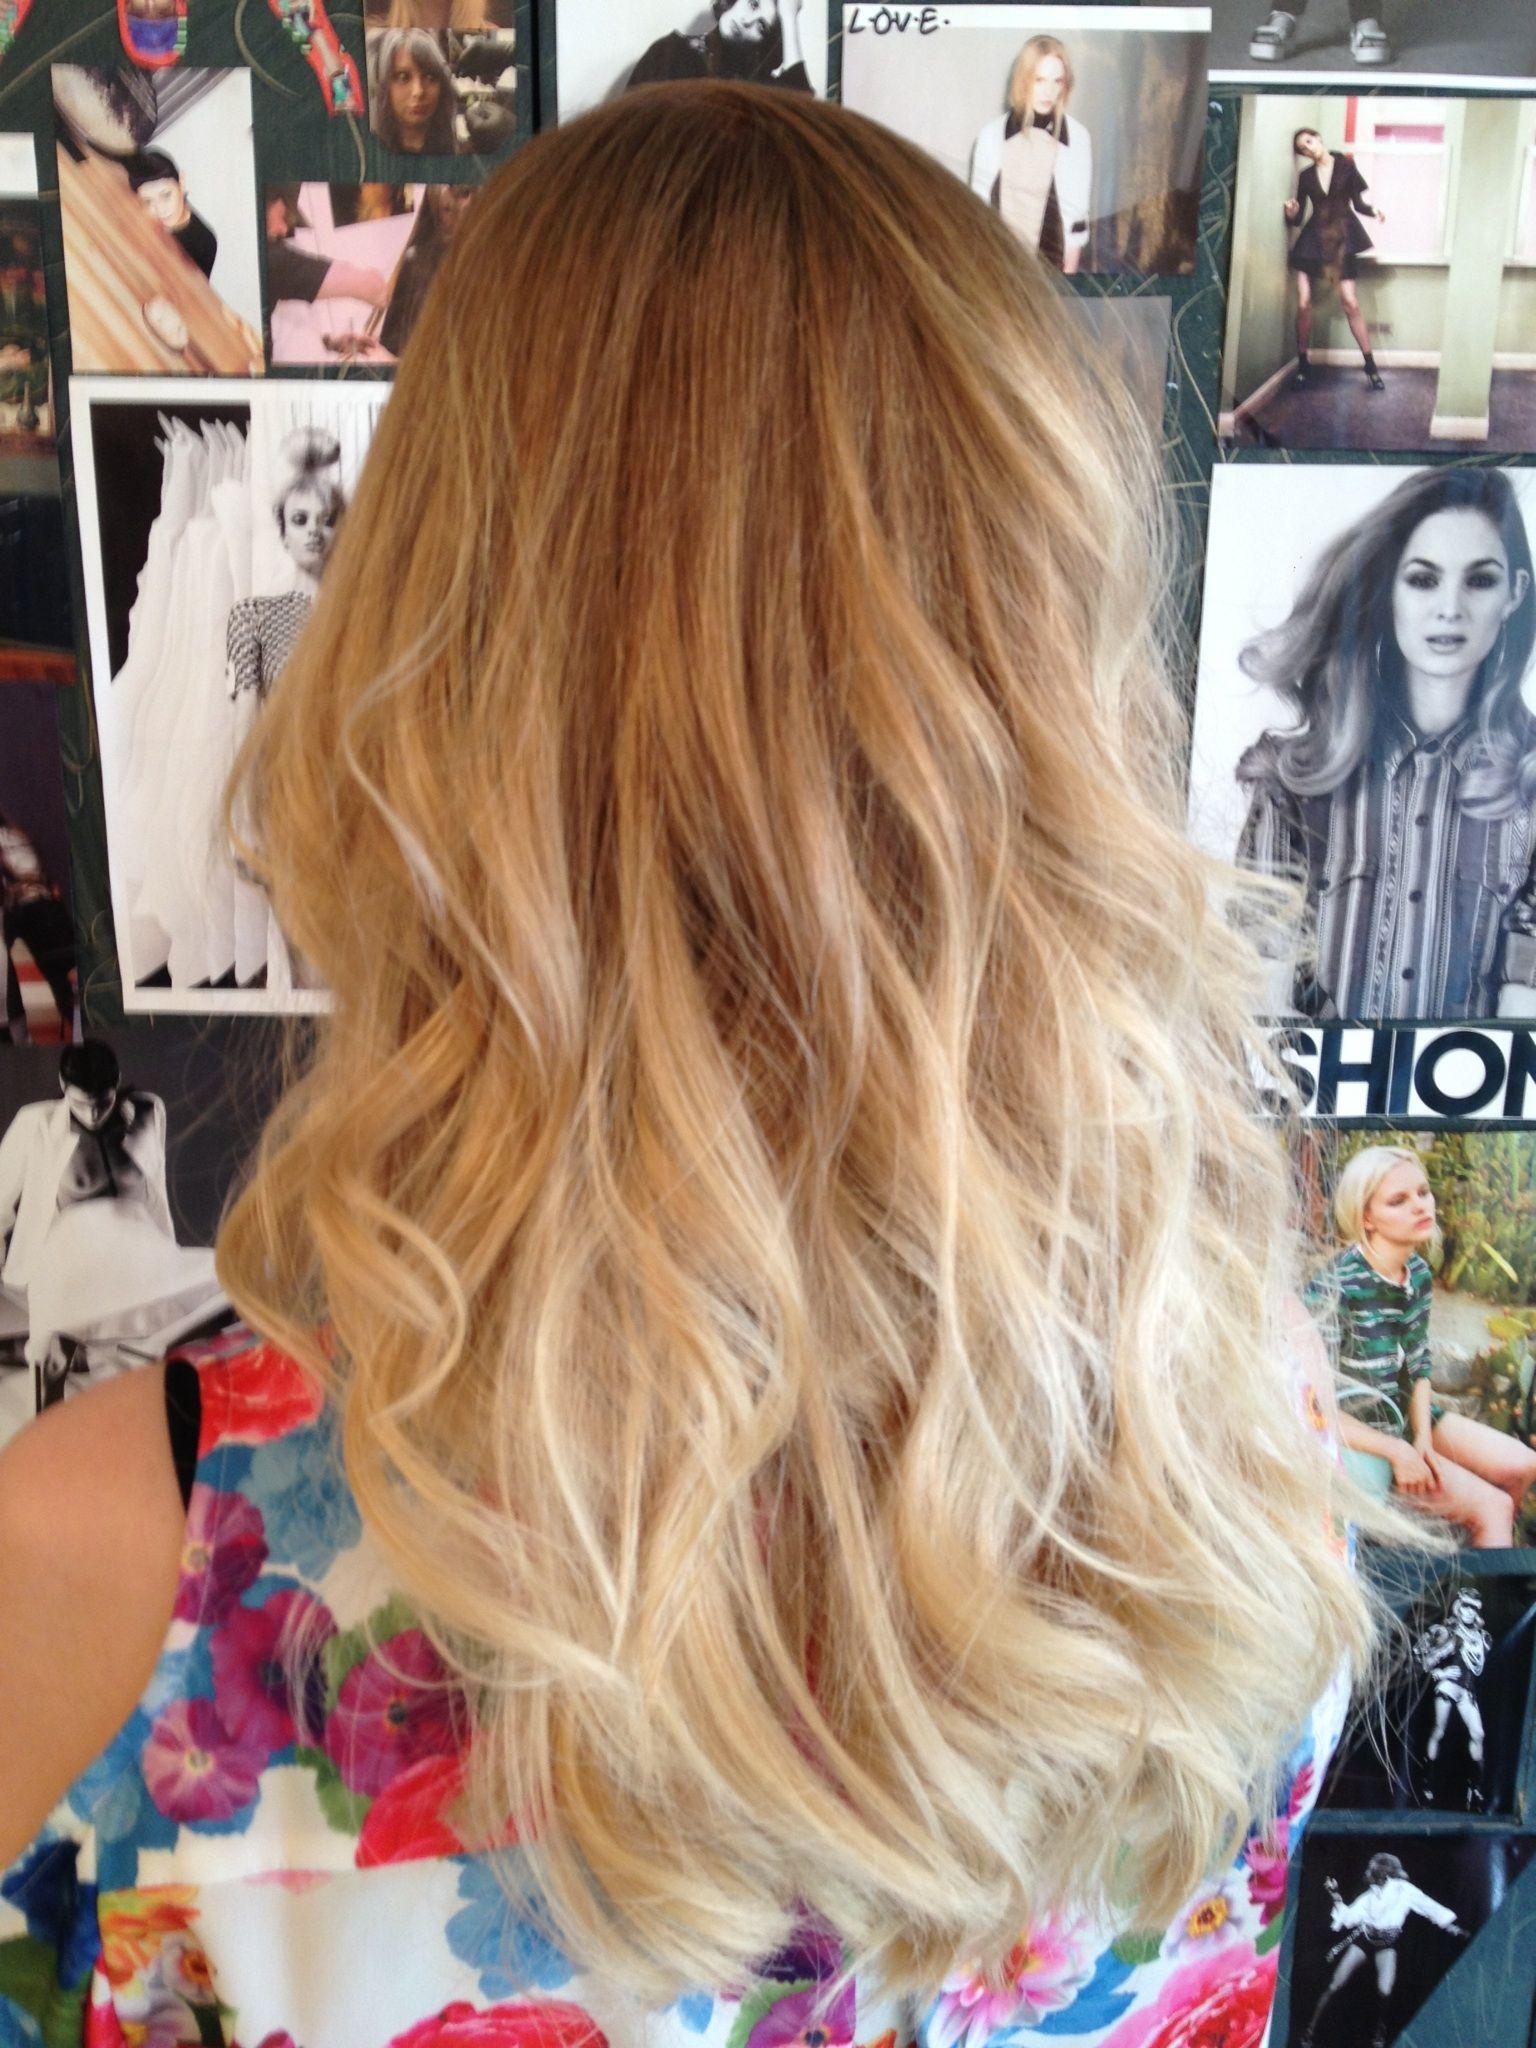 Pin By Santiago Aguero Rodriguez On Hair Blonde Dip Dye Dip Dye Hair Blonde Dye